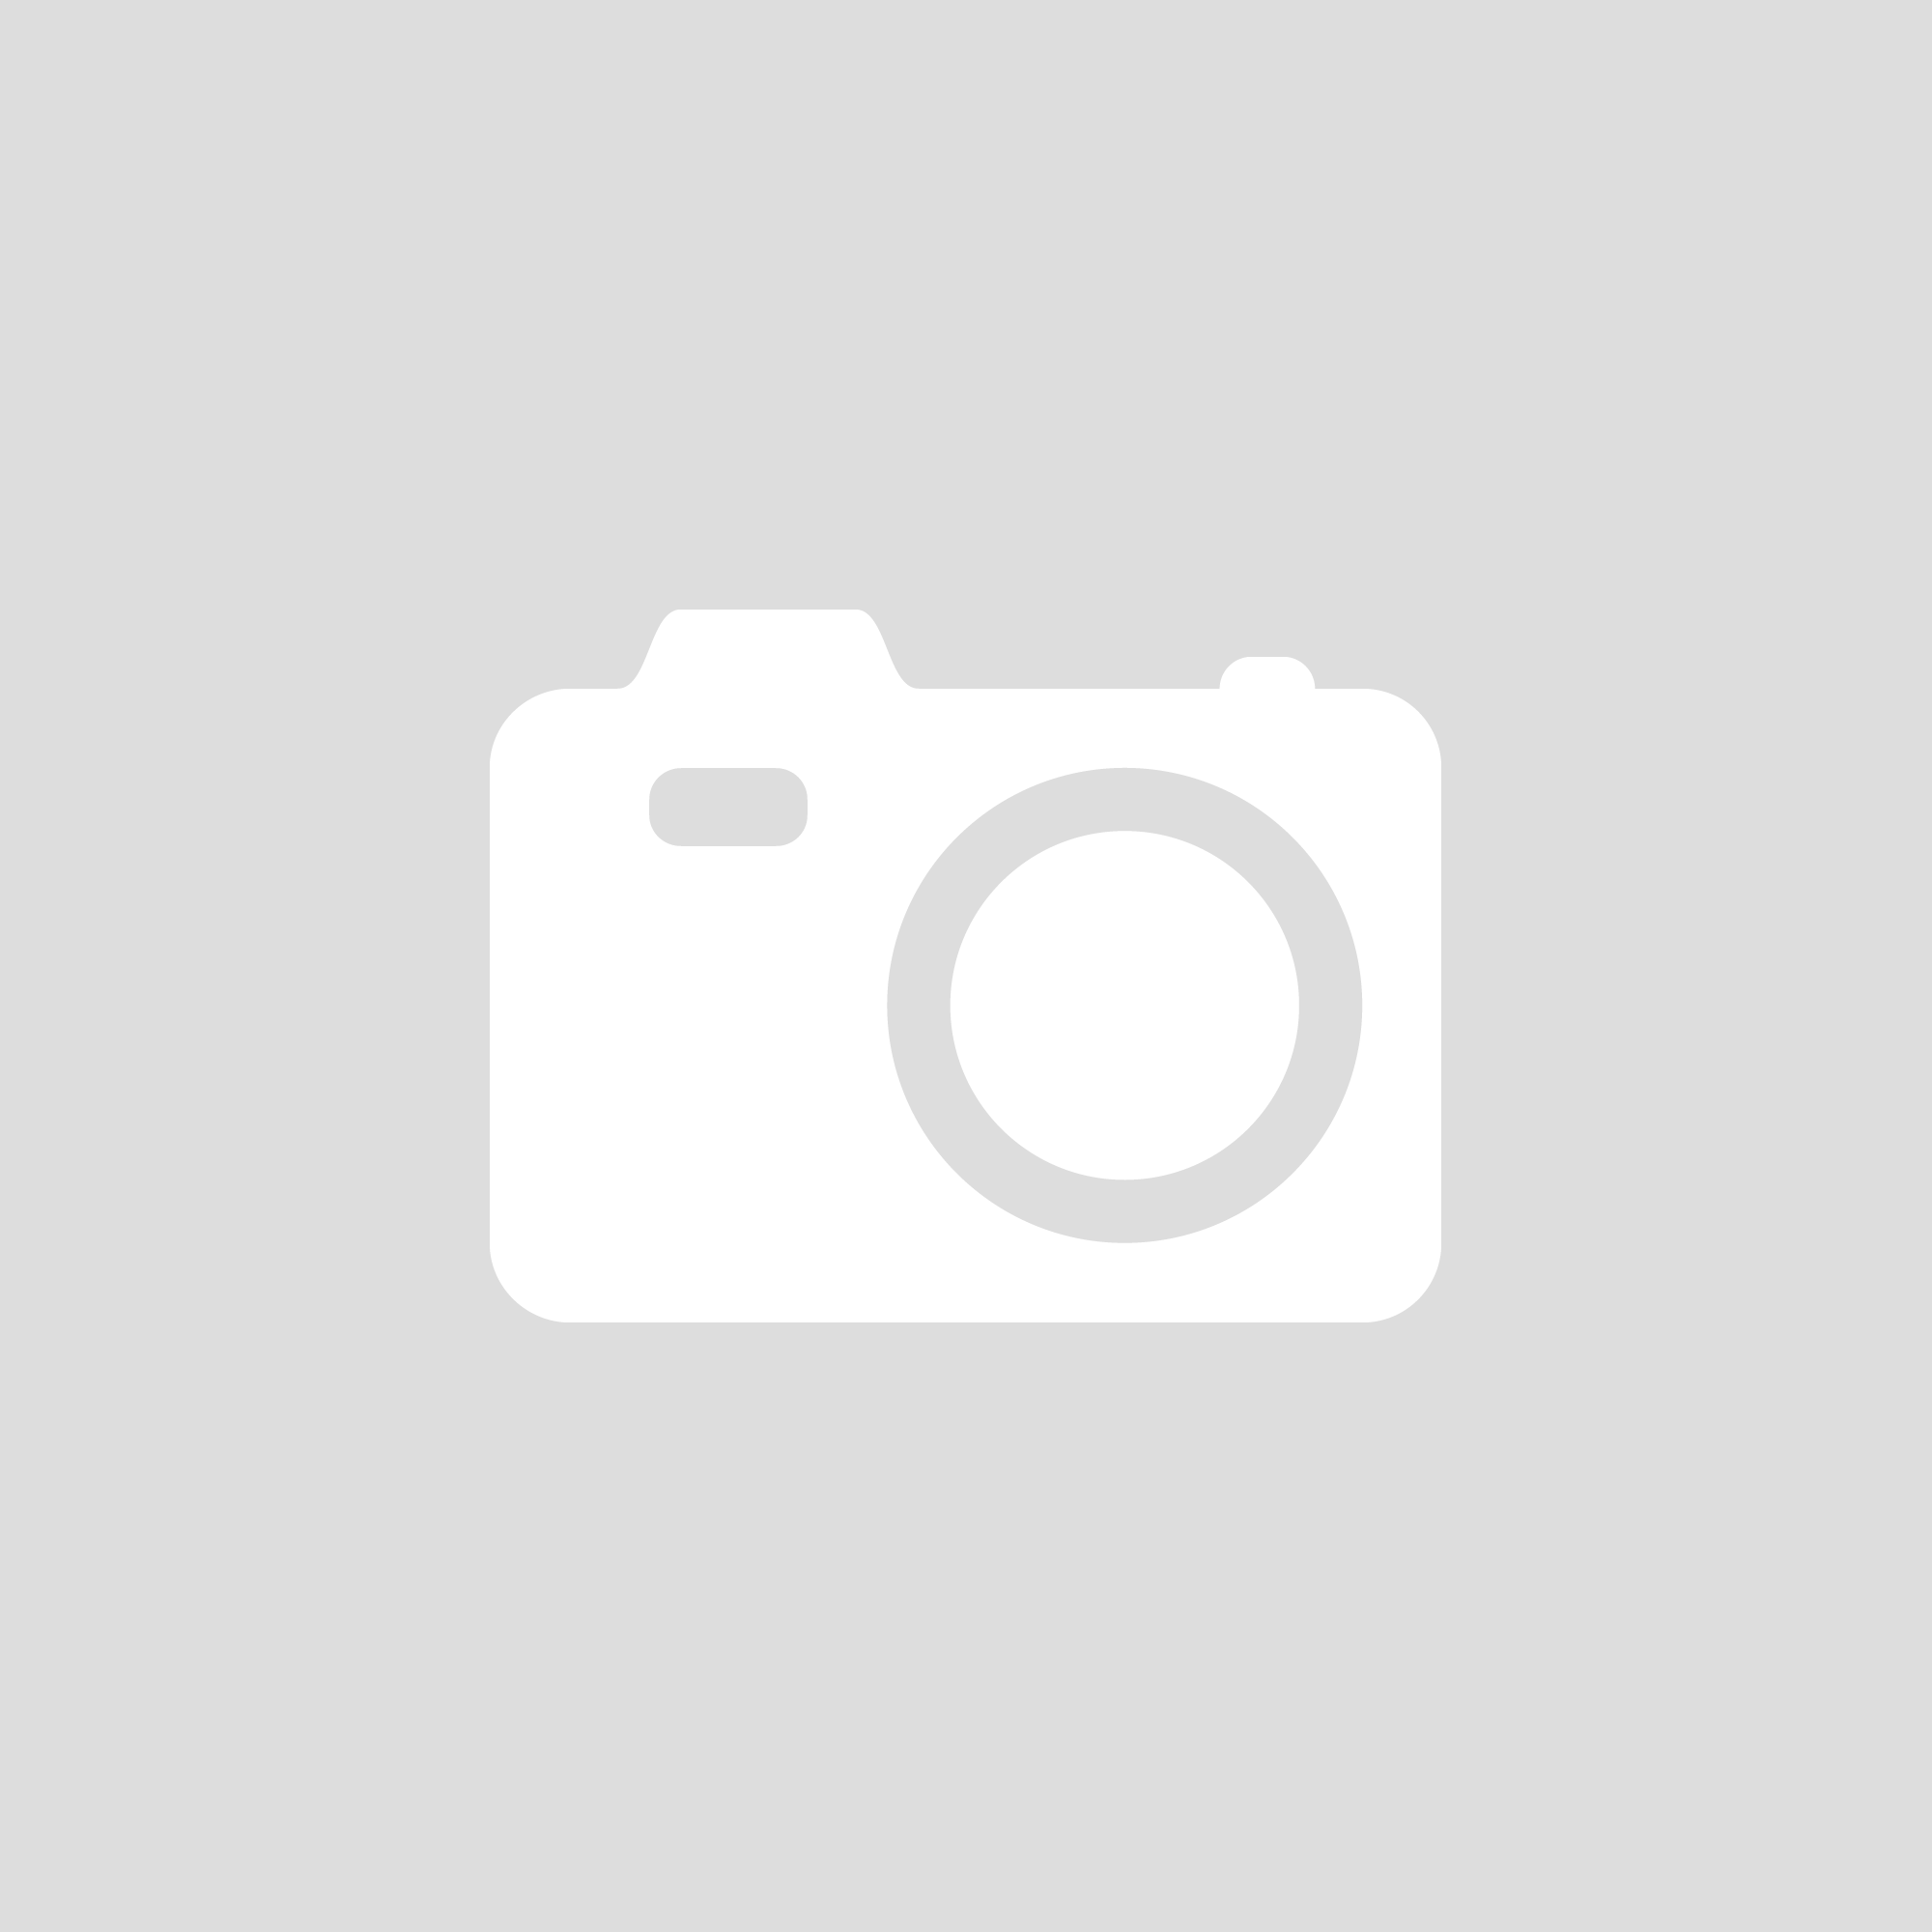 Quartz Plain Black Glitter Wallpaper by Rasch 306064